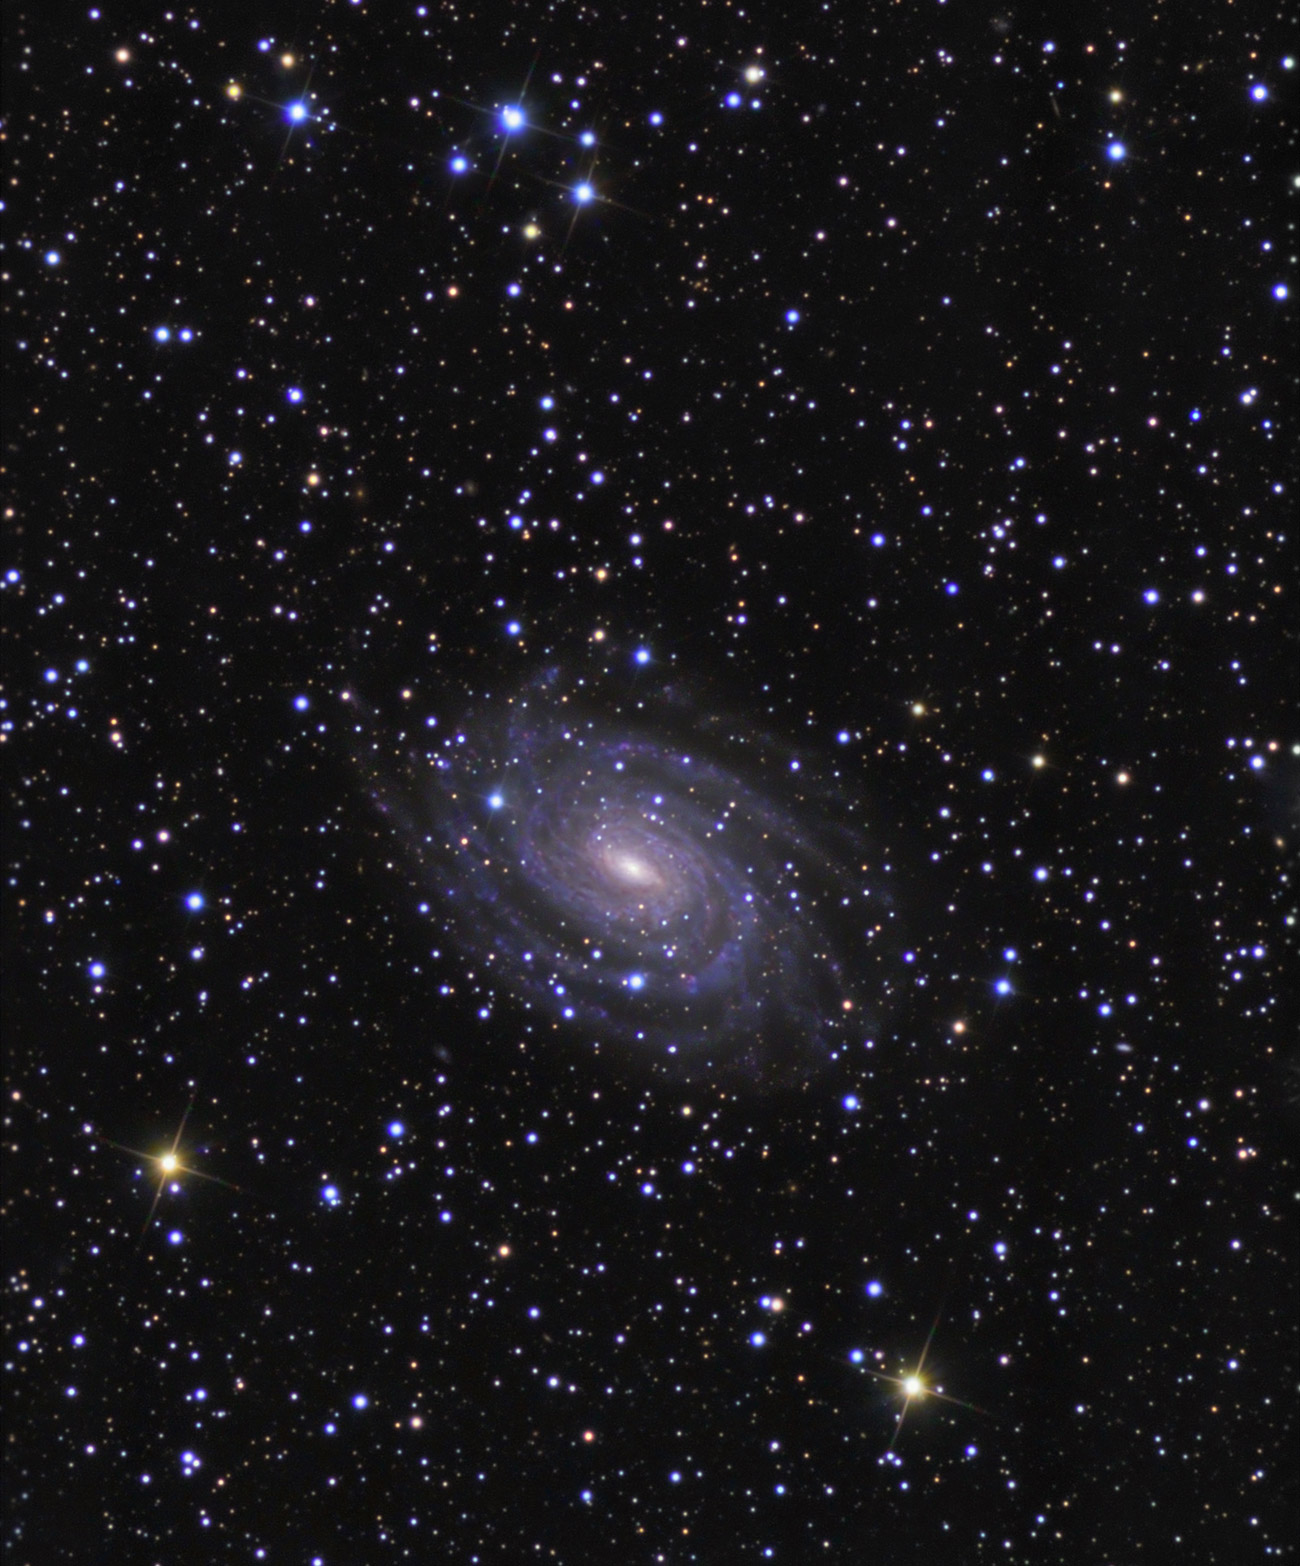 https://i2.wp.com/www.astronomy-pictures.net/beyond-the-stars.jpg